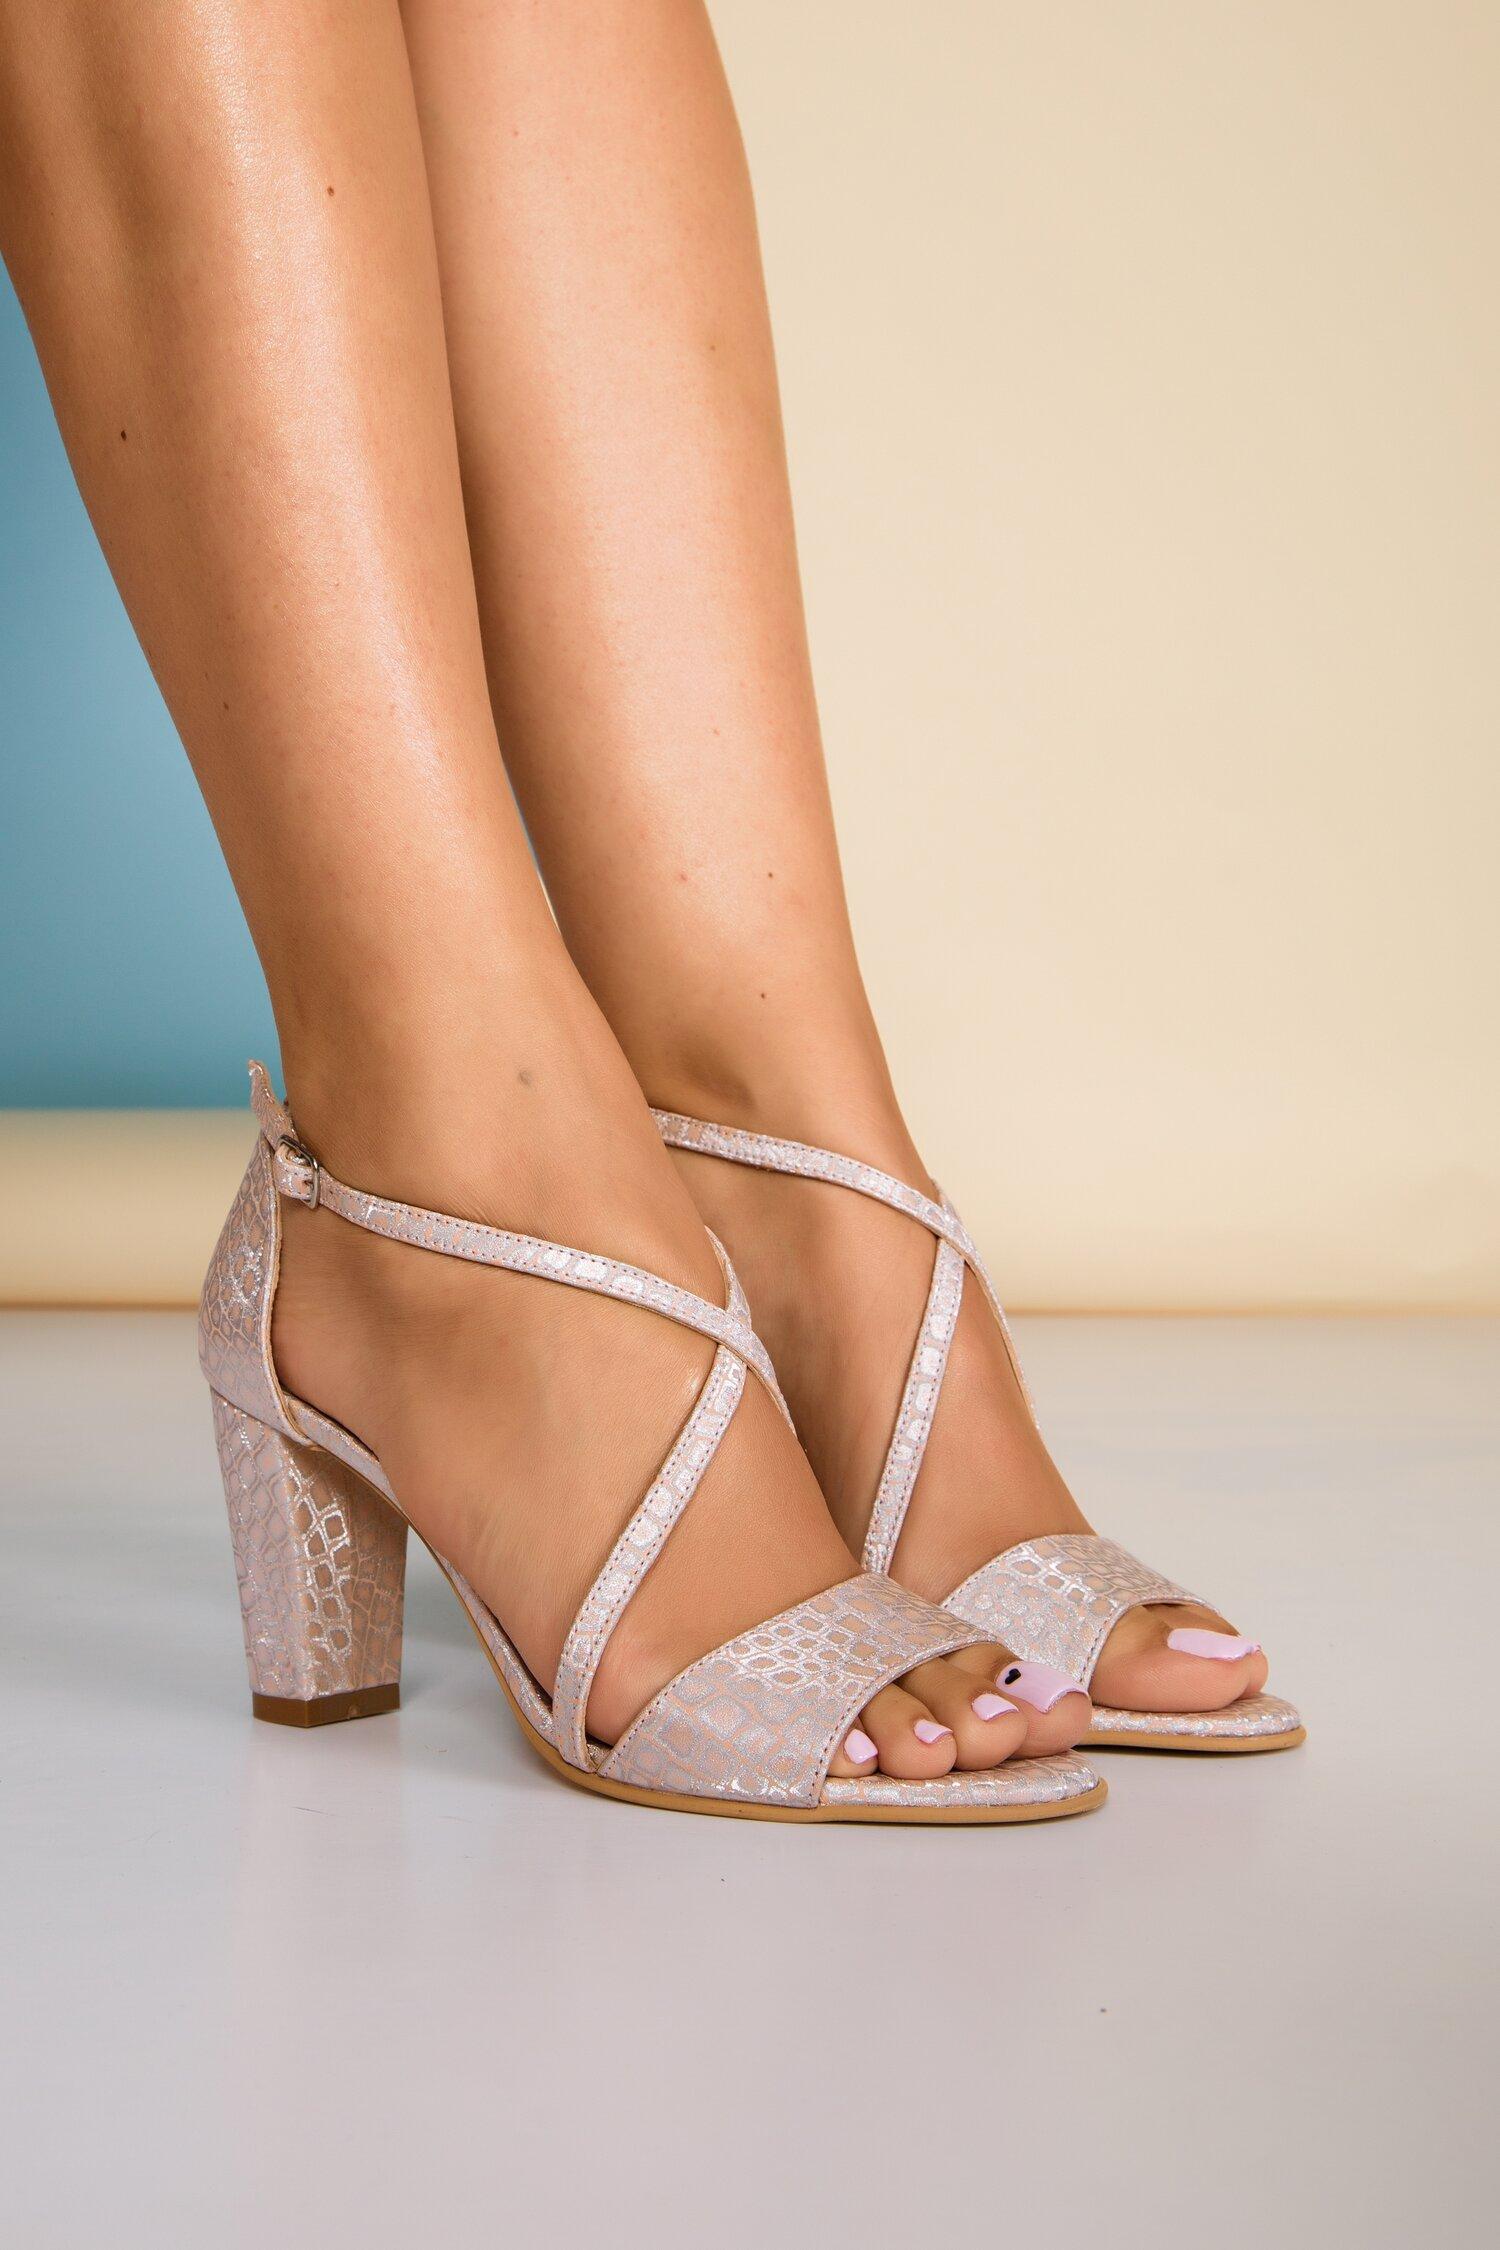 Sandale somon cu insertii stralucitoare